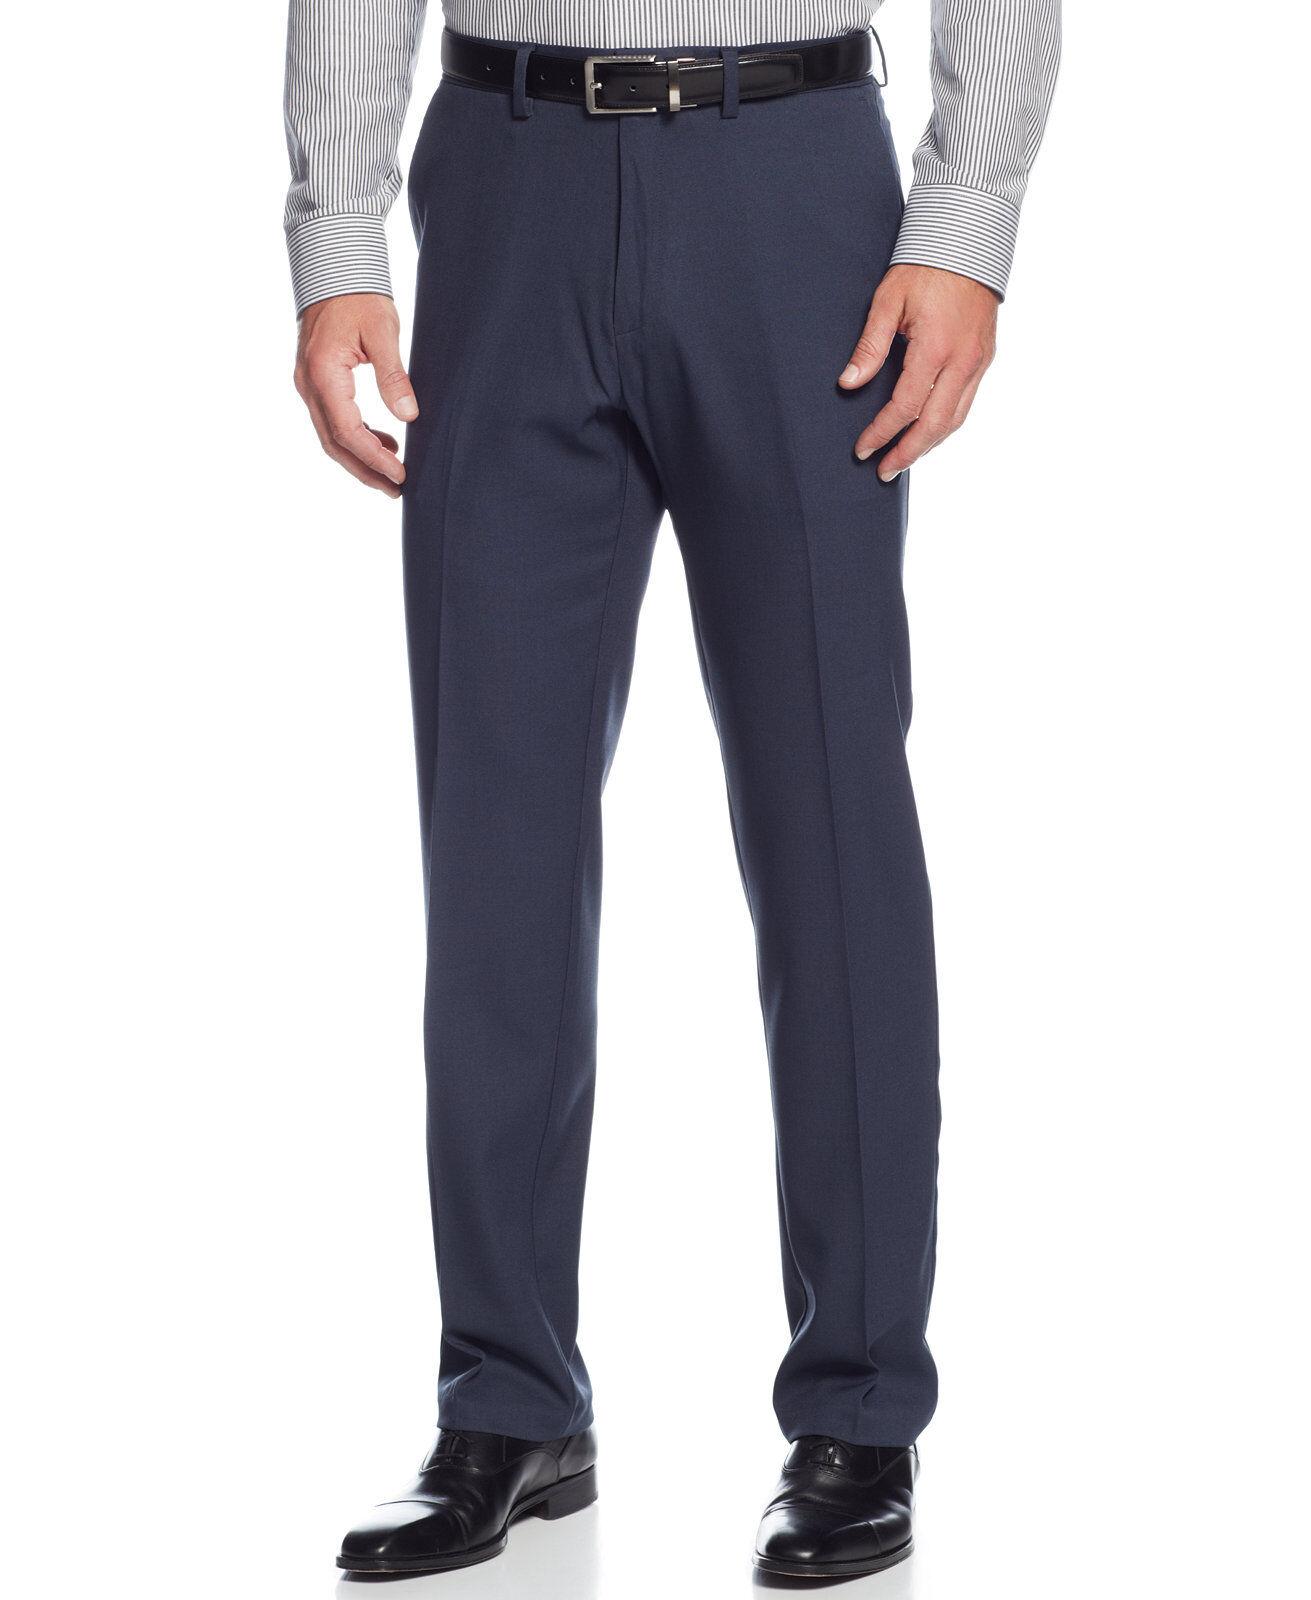 KENNETH COLE REACTION men blueE FLAT FRONT SLIM FIT DRESS PANTS 33 W 32 L